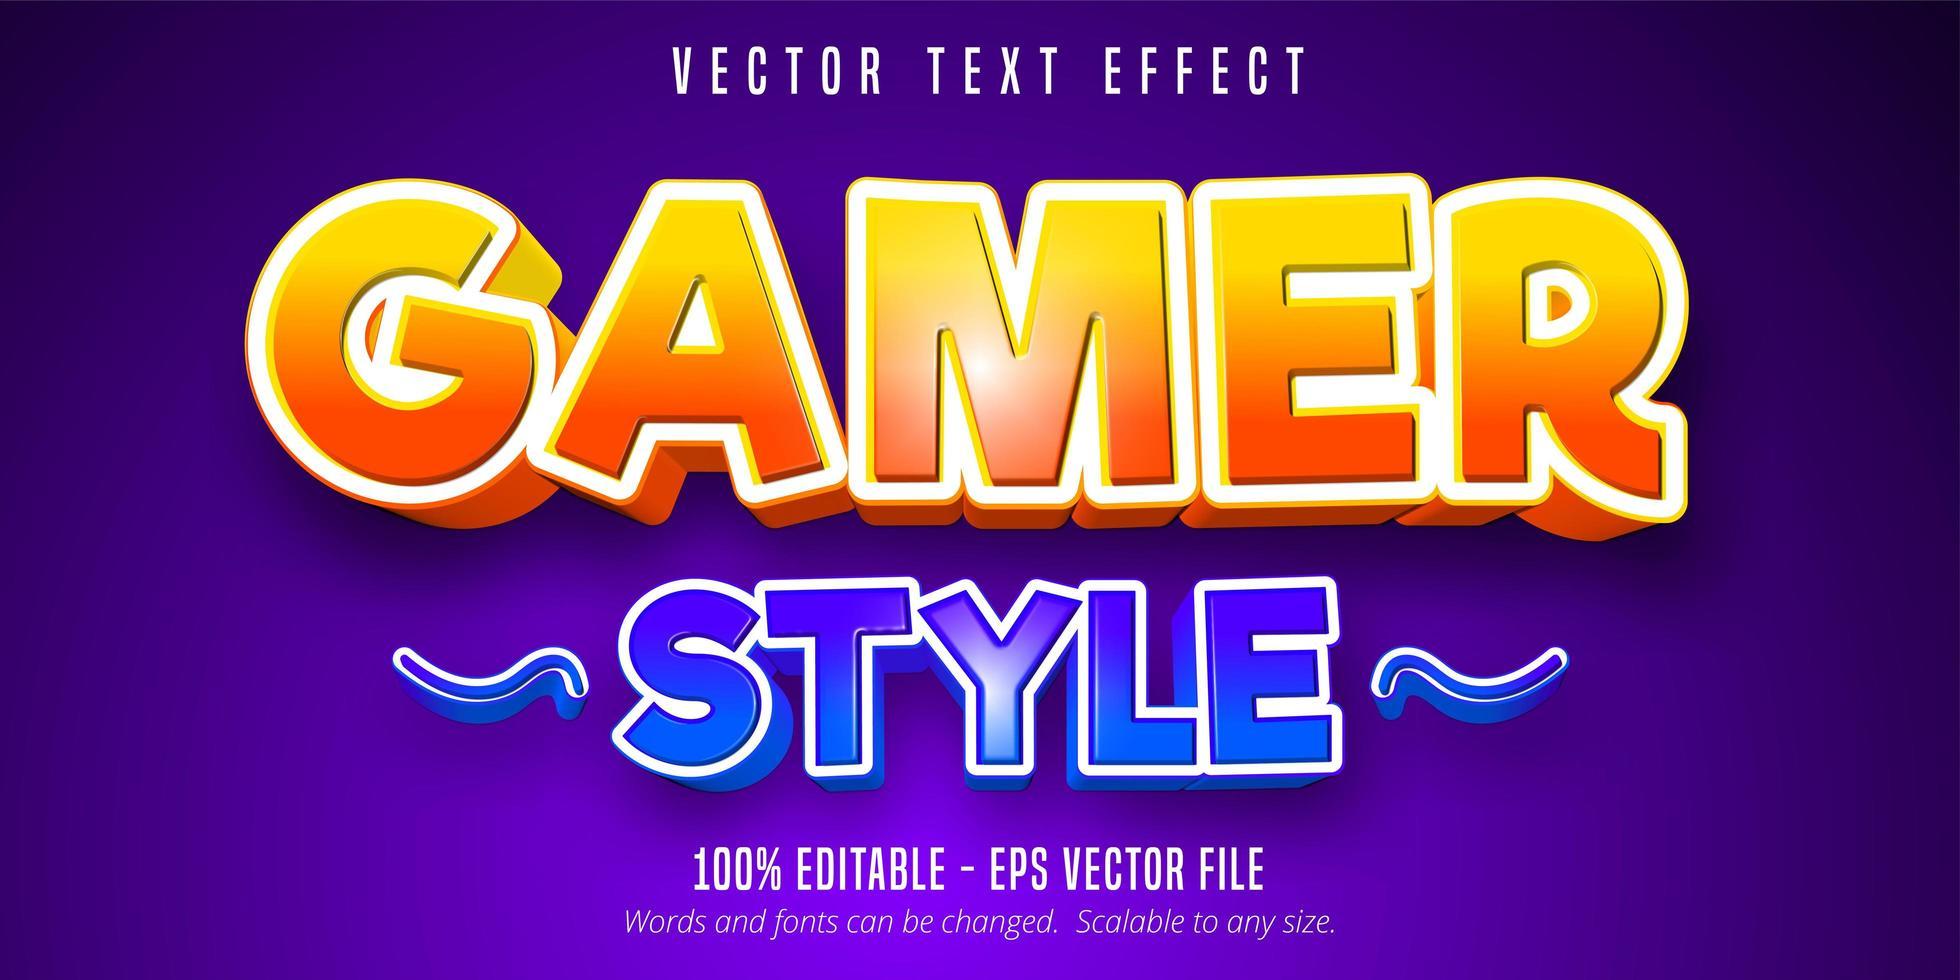 Gamer stil redigerbar texteffekt vektor